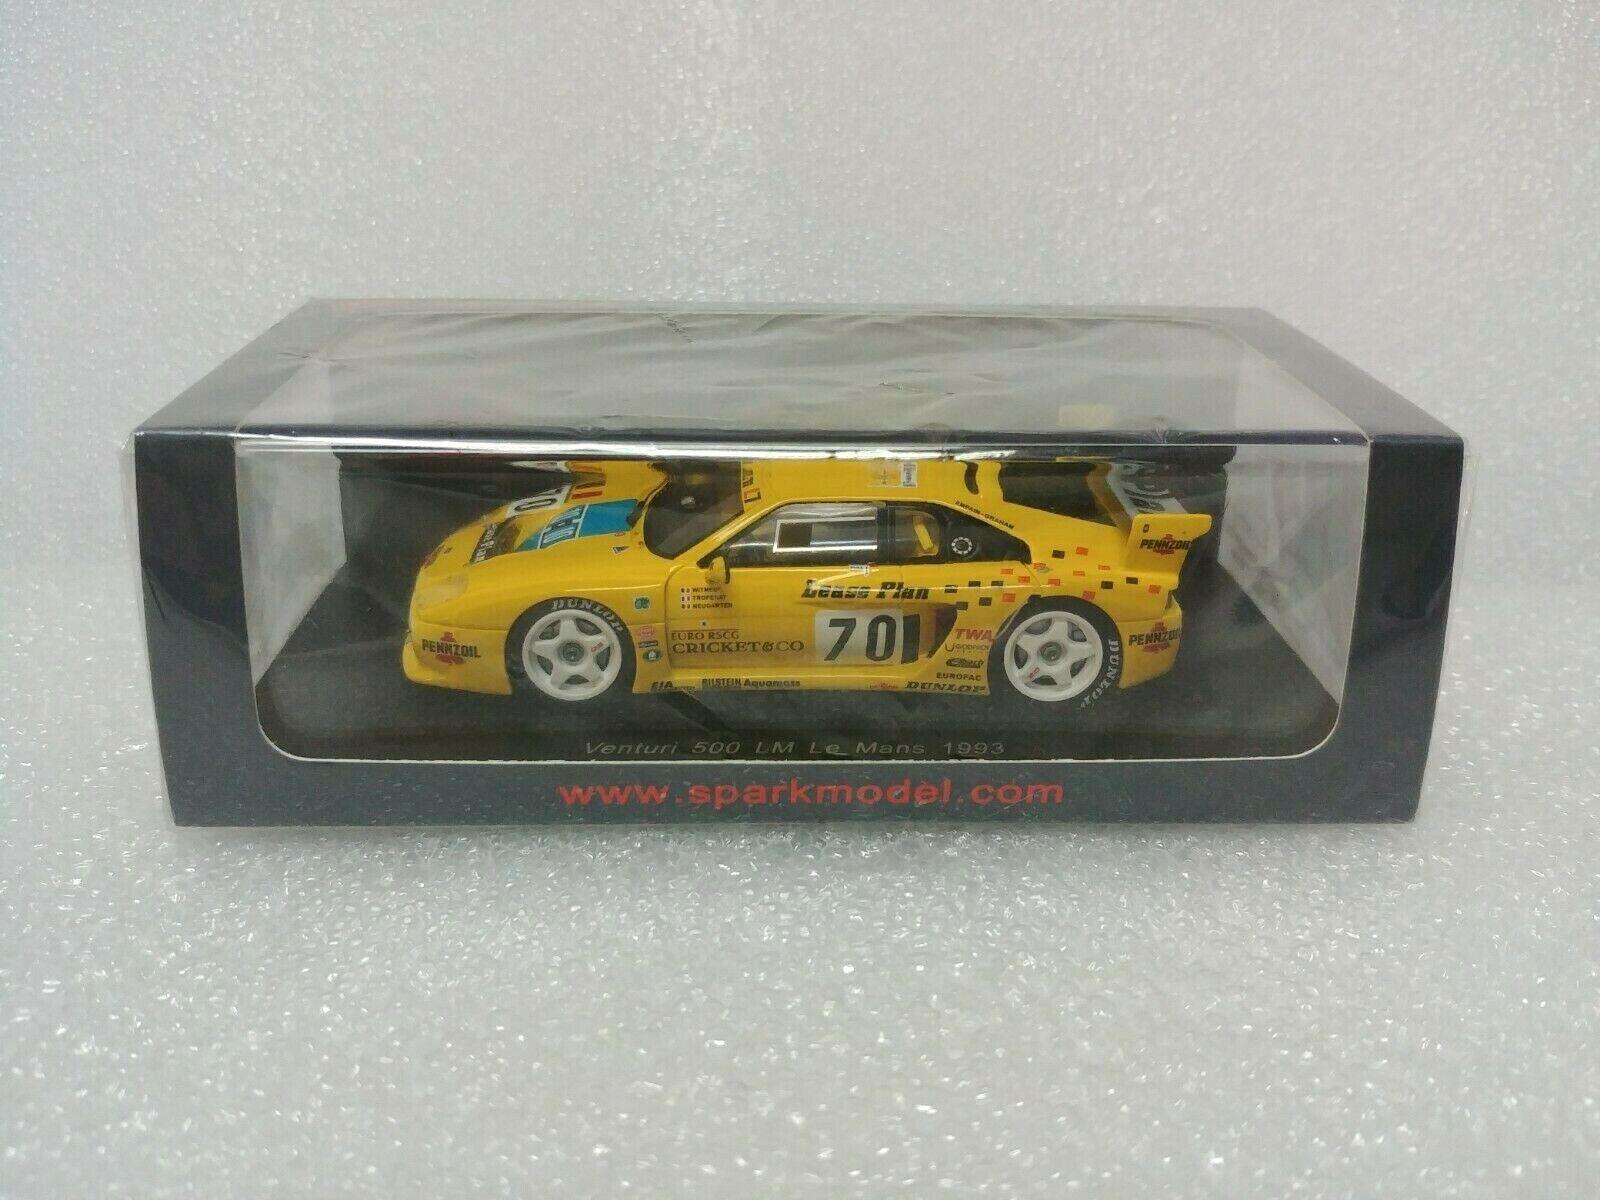 Venturi 500 LM n.70 Le Mans 1993 SPARK MODEL 1 43  S2277